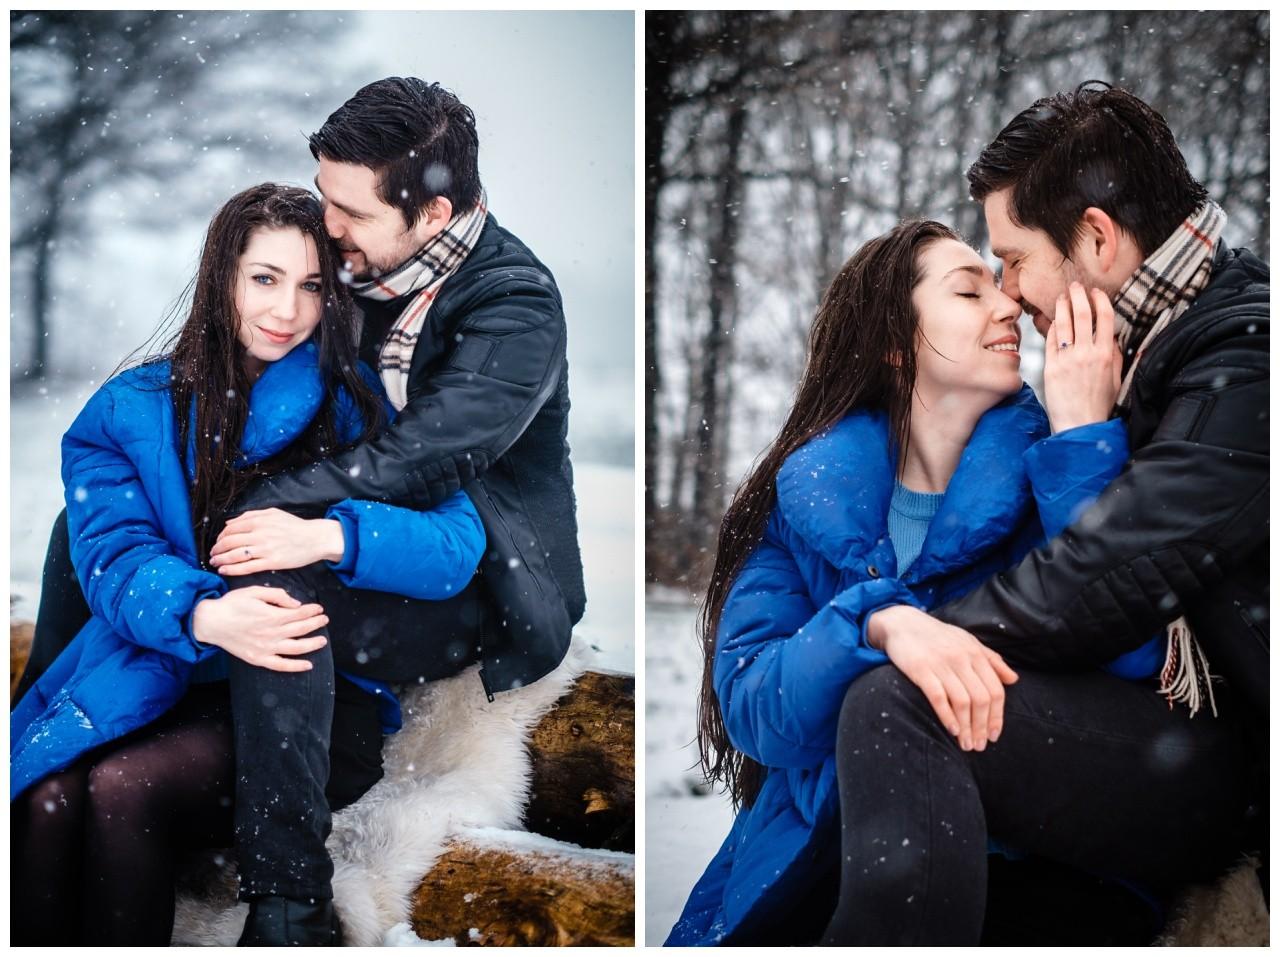 Shooting im Schnee Paarfotos Fotograf 25 - Shooting im Schnee